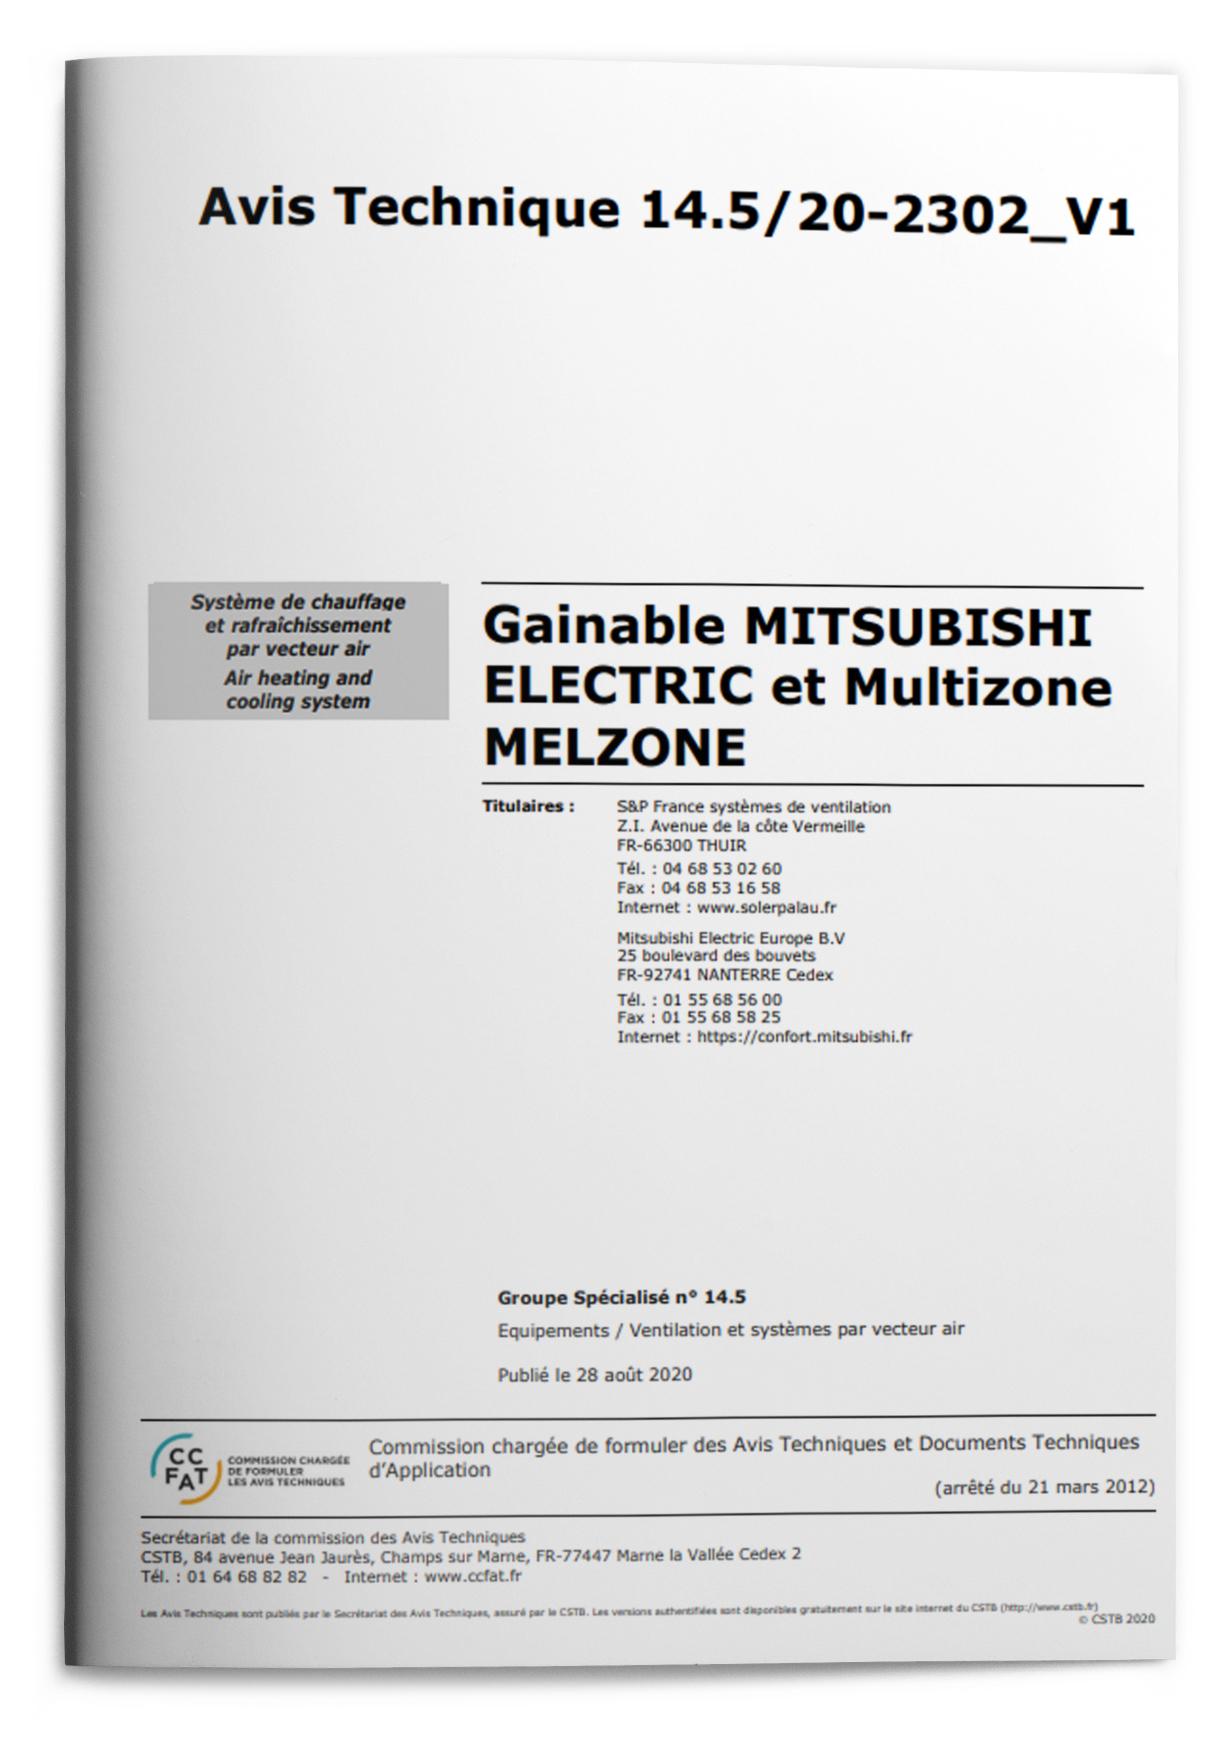 ATEC Gainable Mitsubishi Electric et Multizoning Melzone